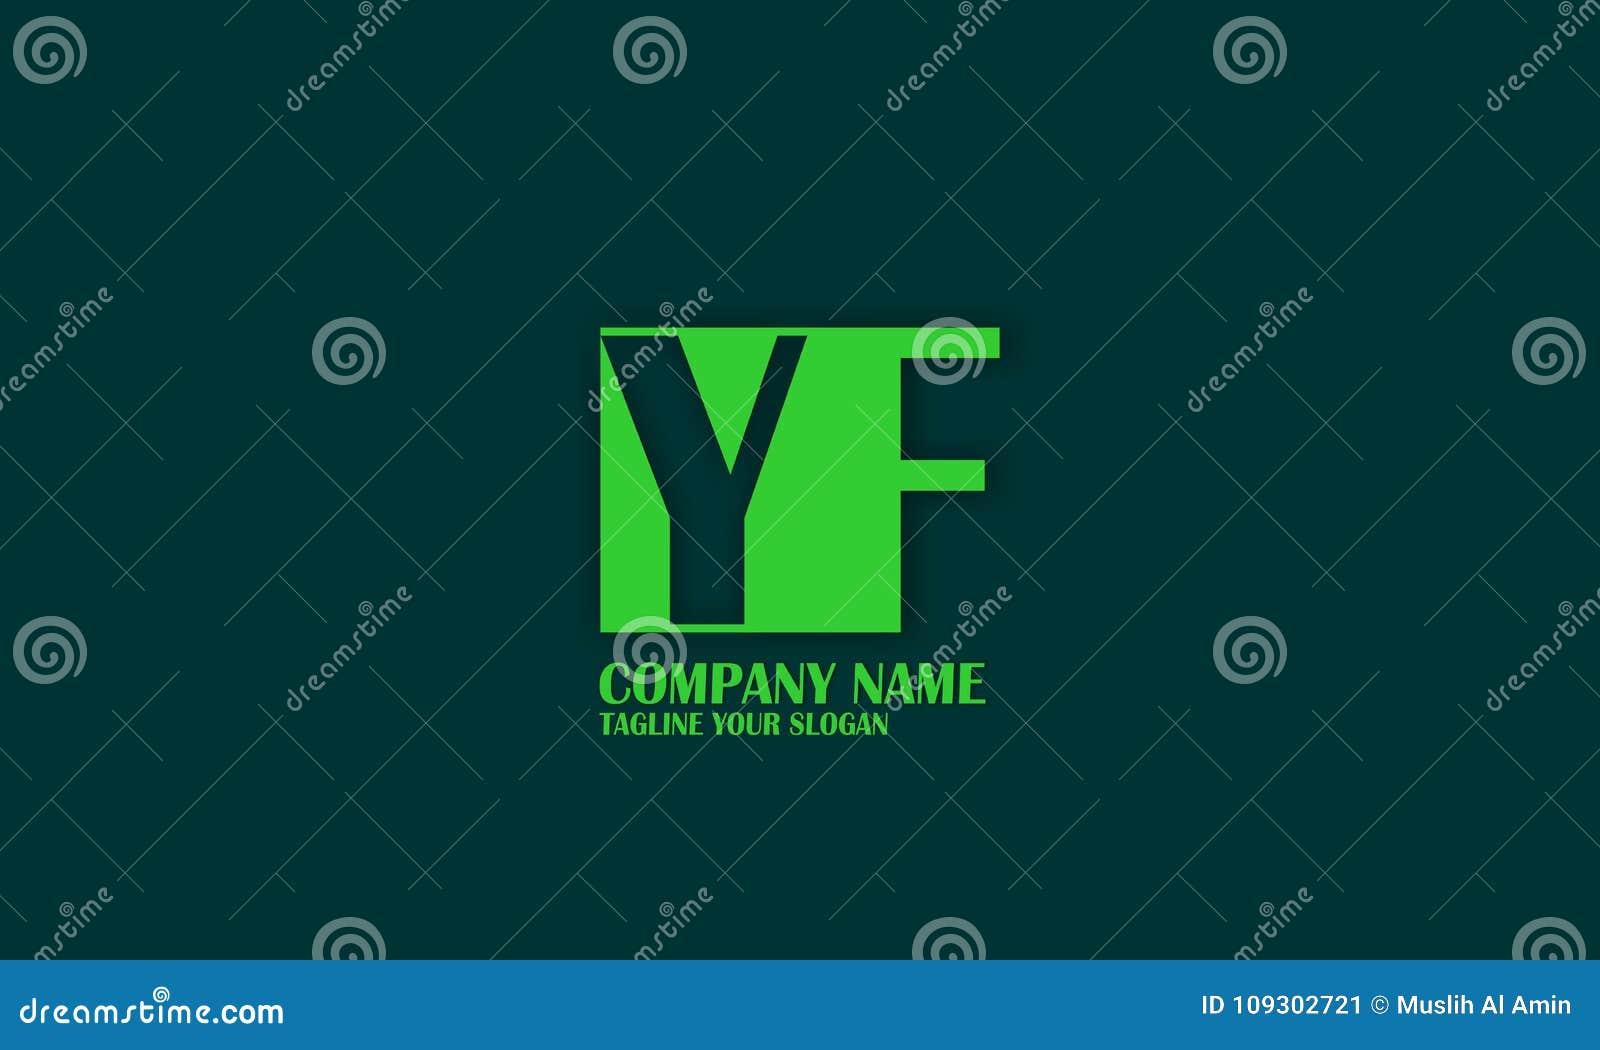 �yf�y�_YF,YFLetterLogoVectorDesign.StockVector-Illustrationoffont,fashion:109302721